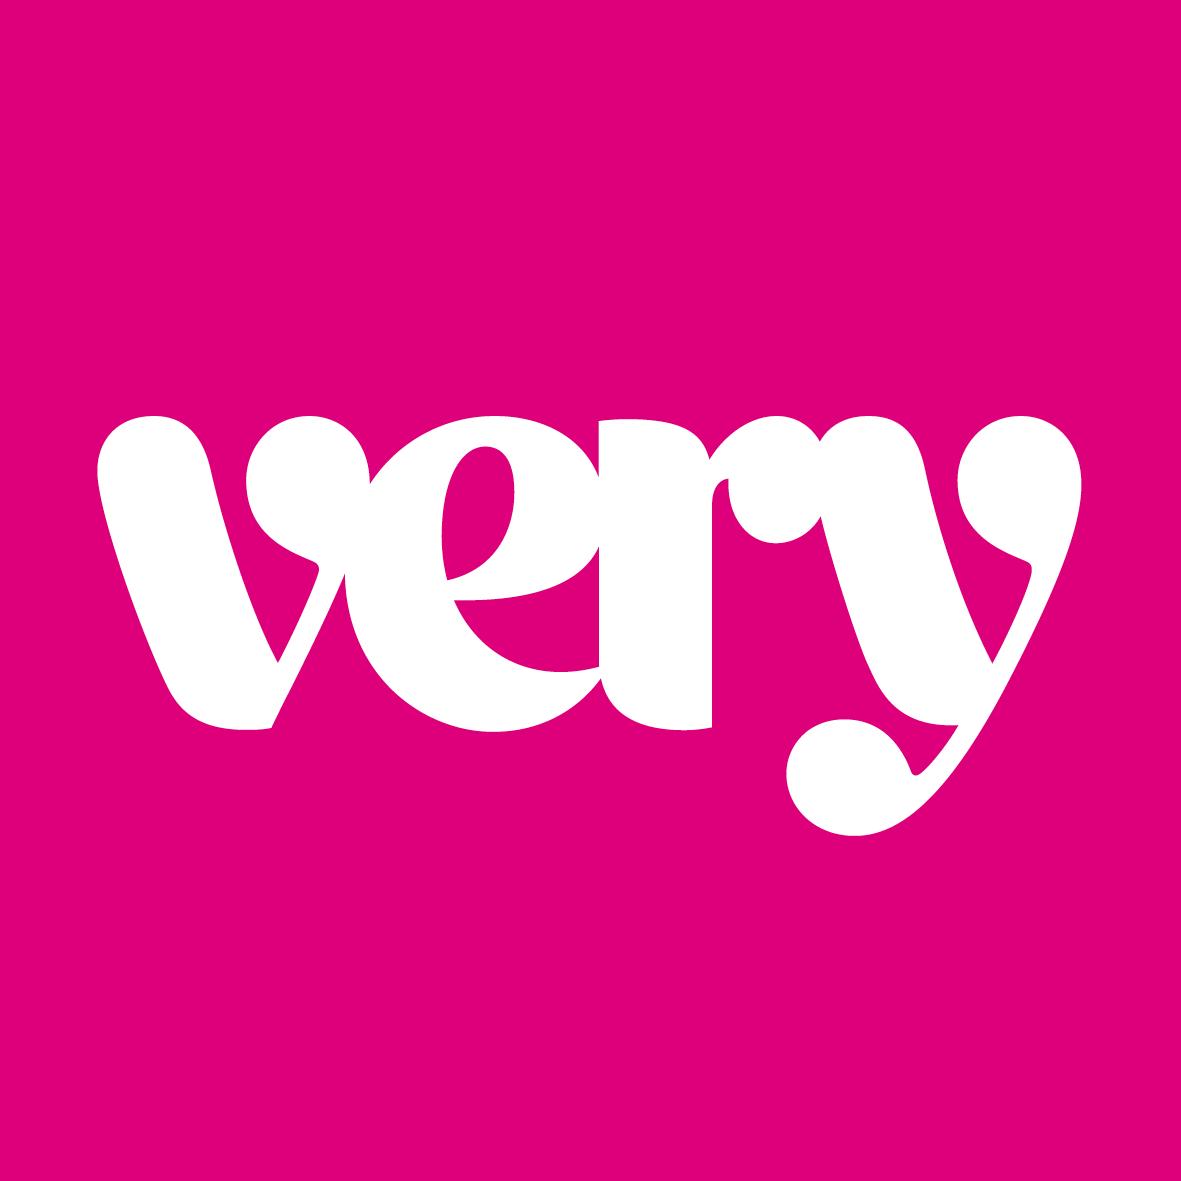 Very logo